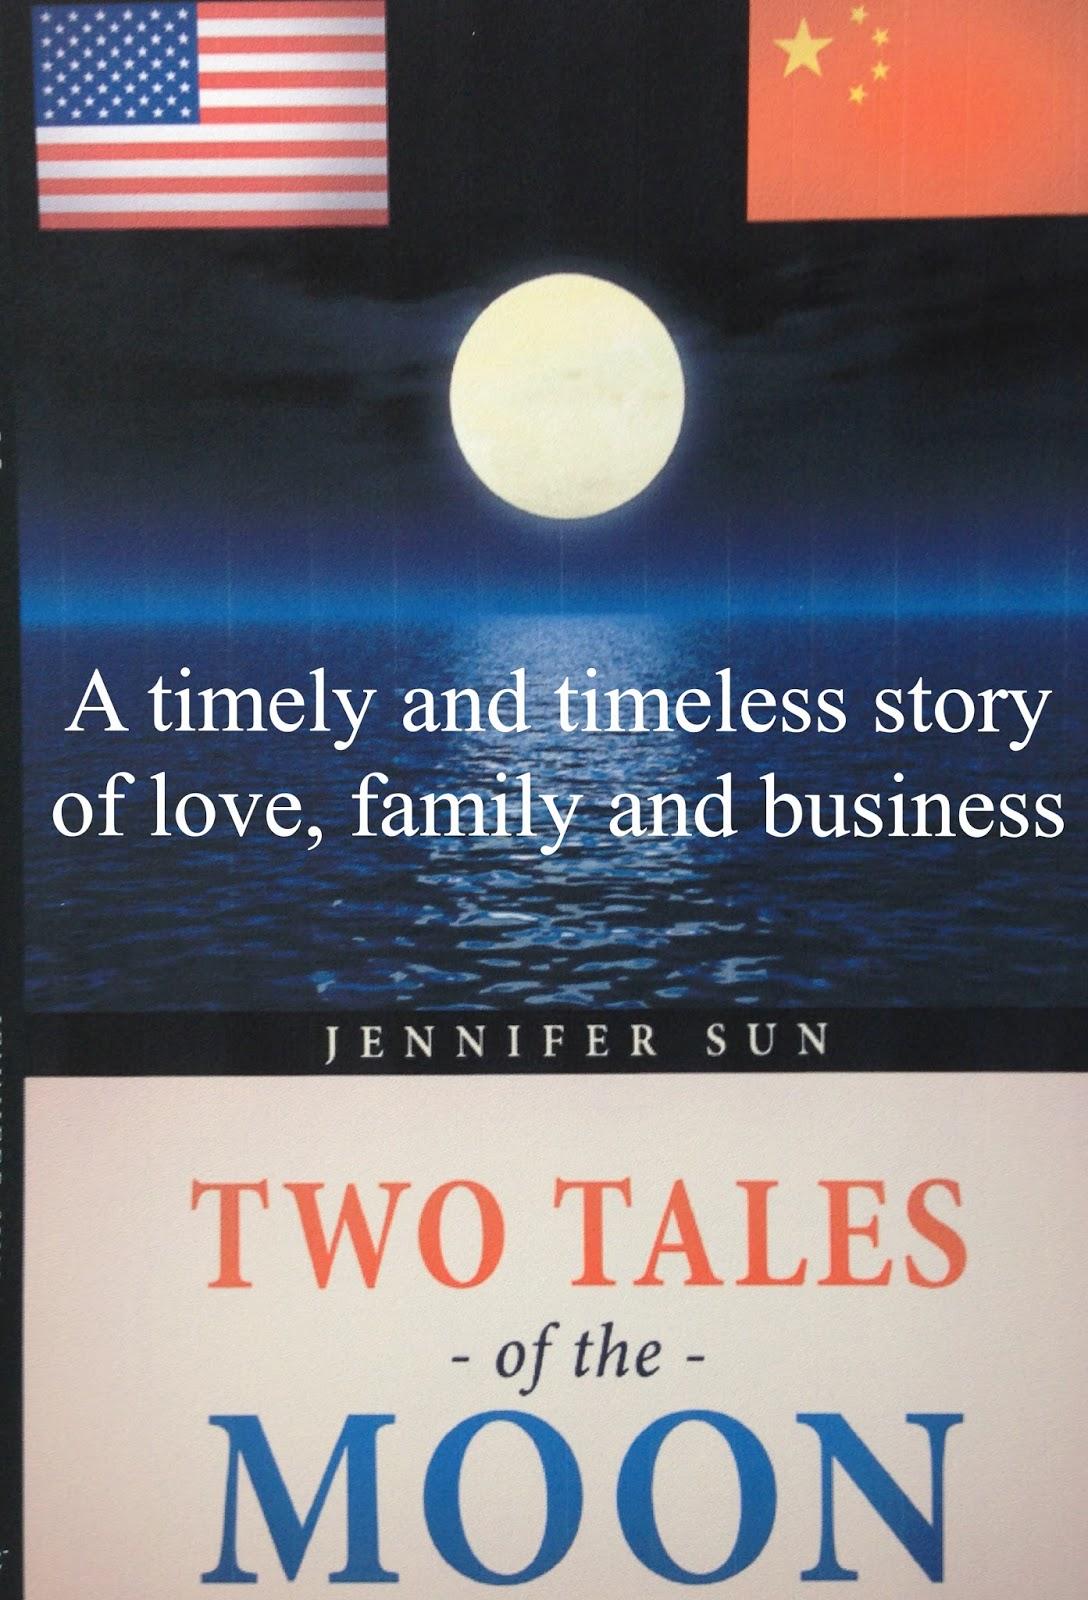 Im shelf ish 2015 title two tales of the moon author jennifer sun release date october 22 2015 publisher jennifer sun genre literary fiction format ebook paperback fandeluxe Choice Image